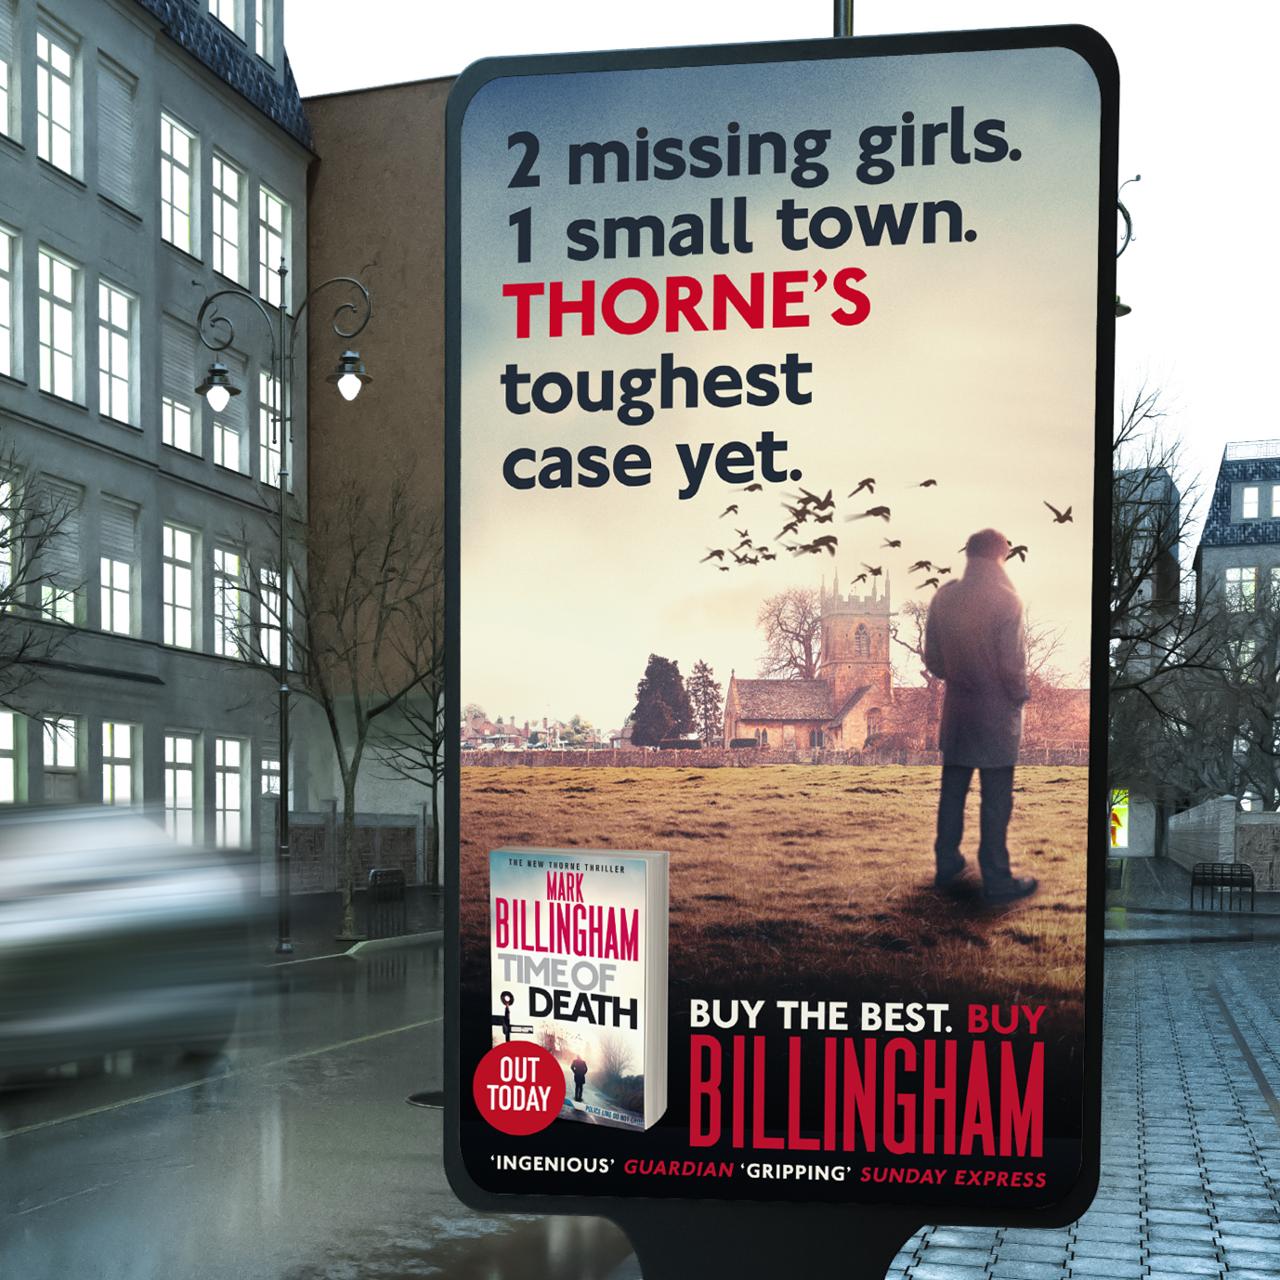 mark billingham time of death animation advert